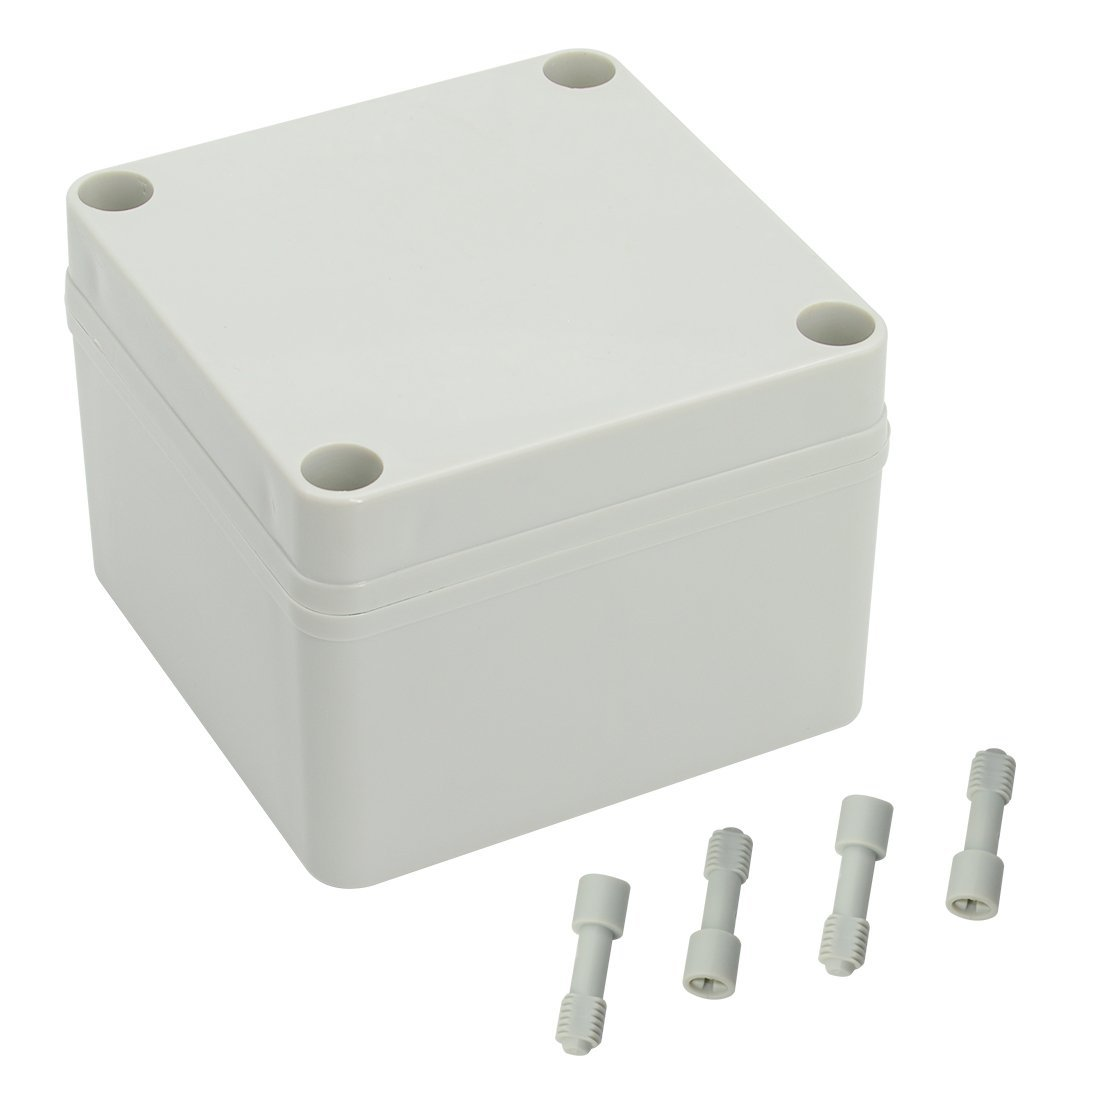 LeMotech Waterproof Dustproof IP67 Junction Box DIY Case Enclosure Gray 3.9'' x 3.9'' x 3''(100mm x 100mm x 75mm)